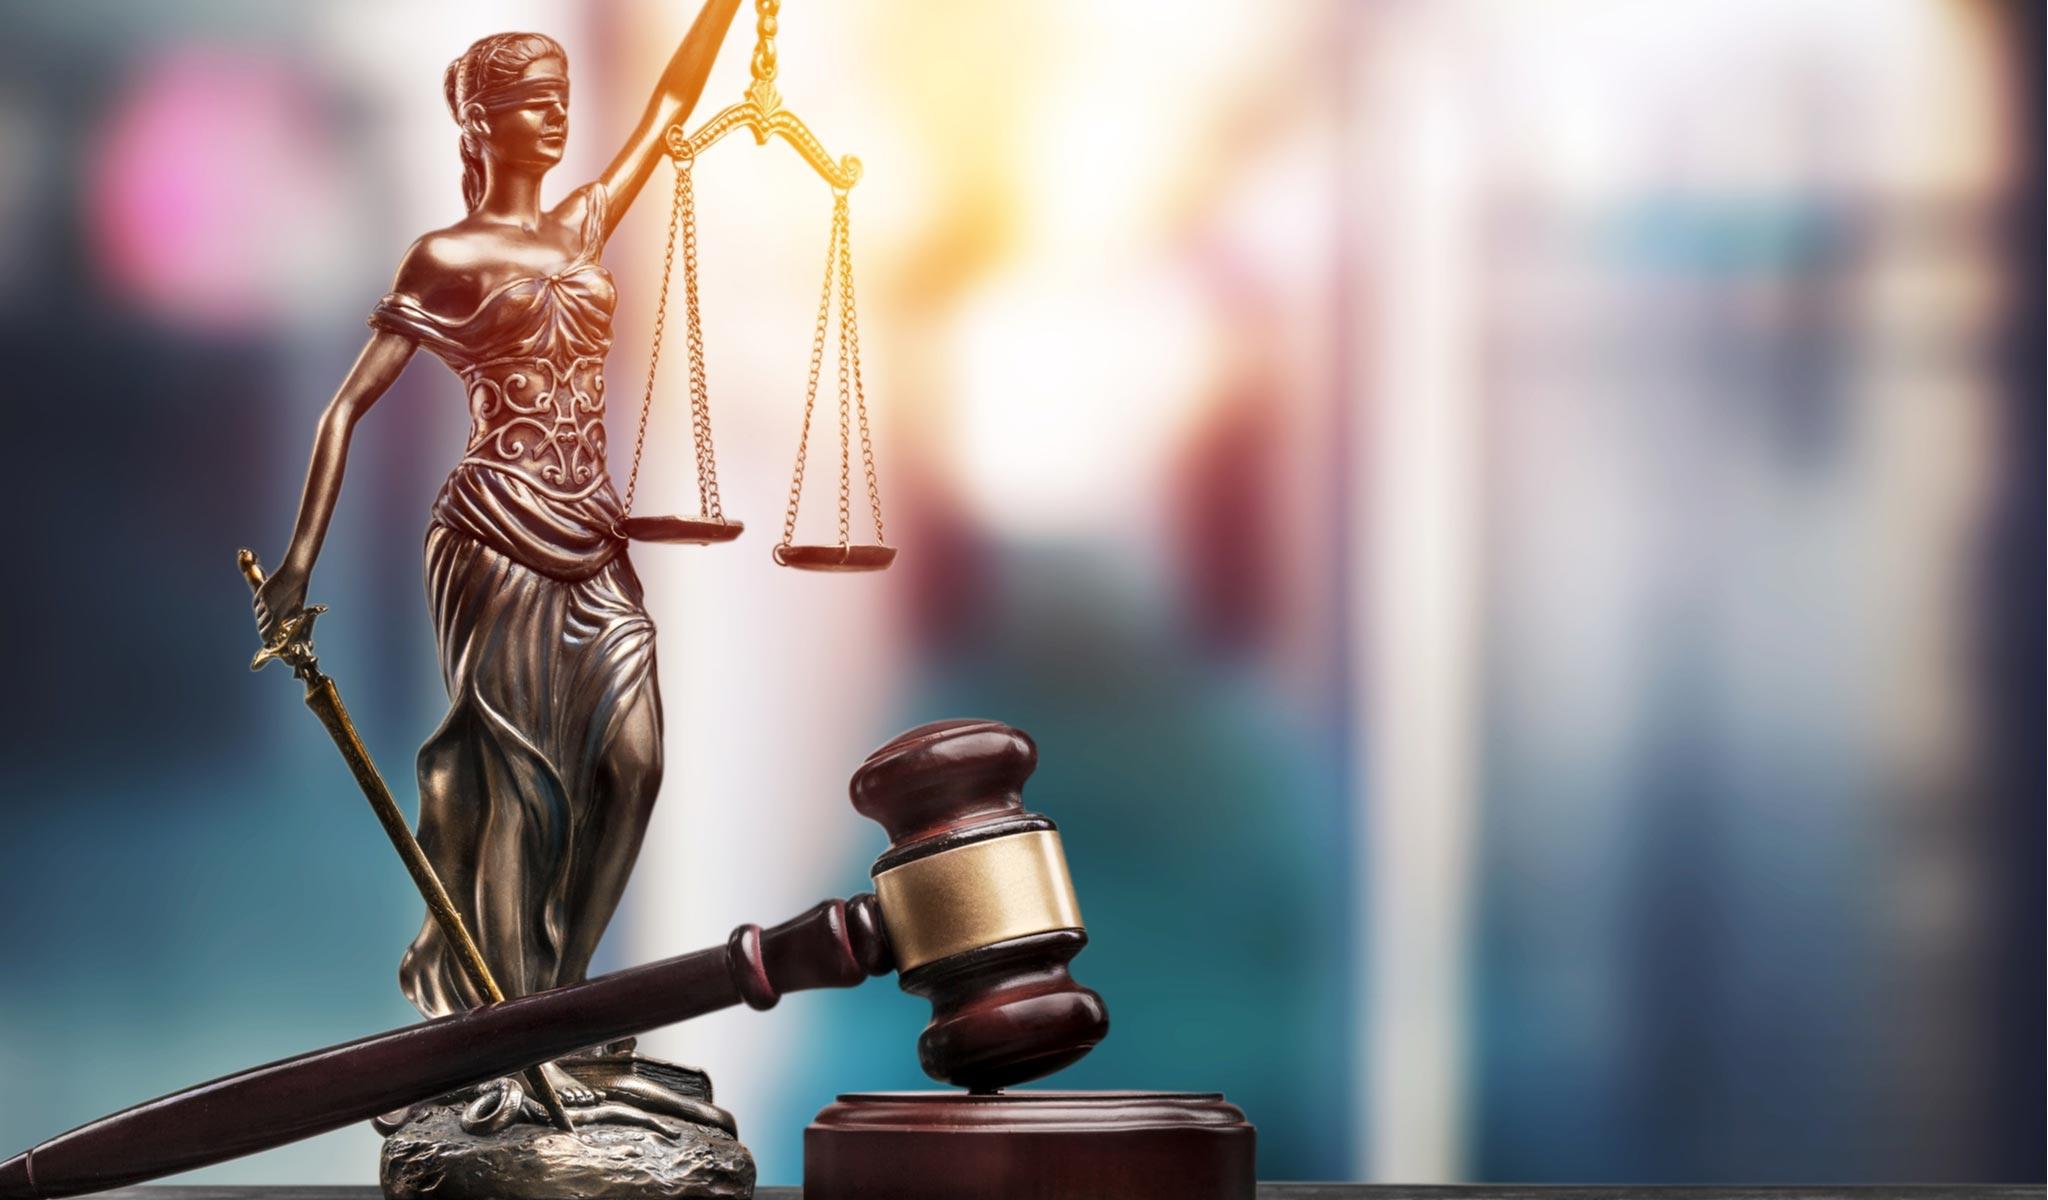 Trump Inherits Judicial Appointments | Atty. Michael Schmiege